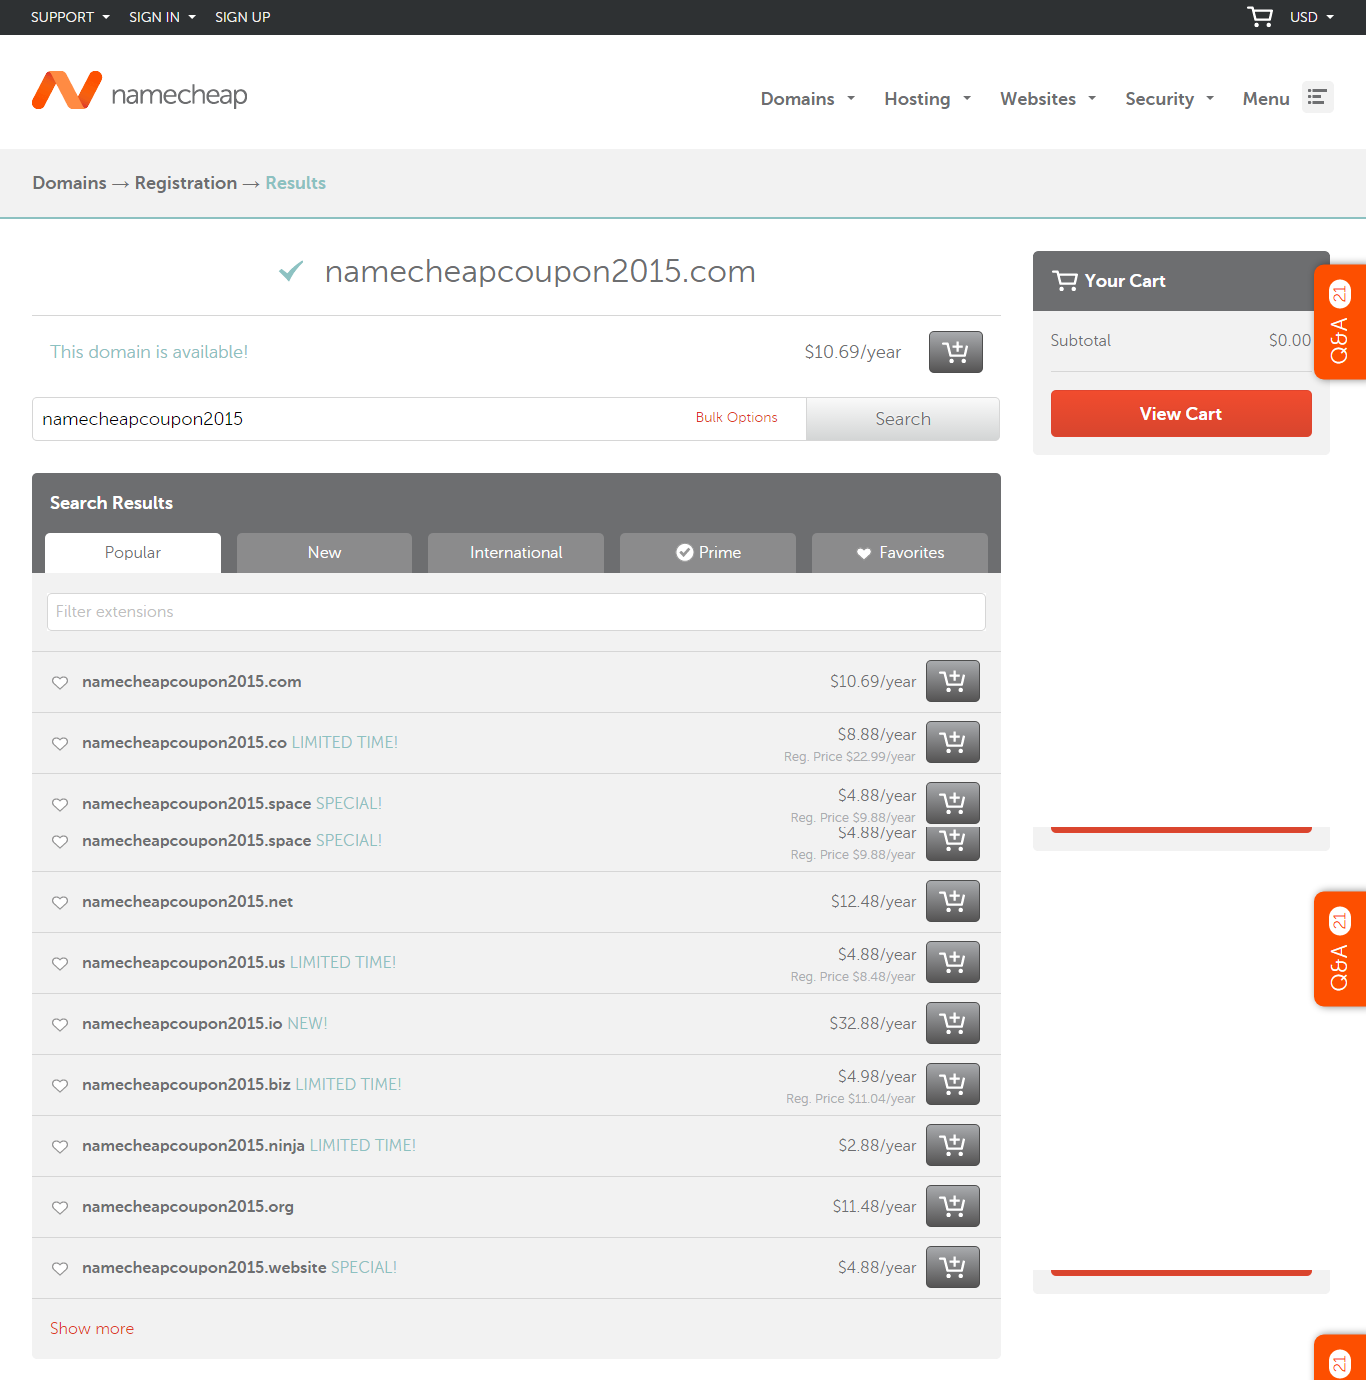 bulk domain namecheapcoupon2015